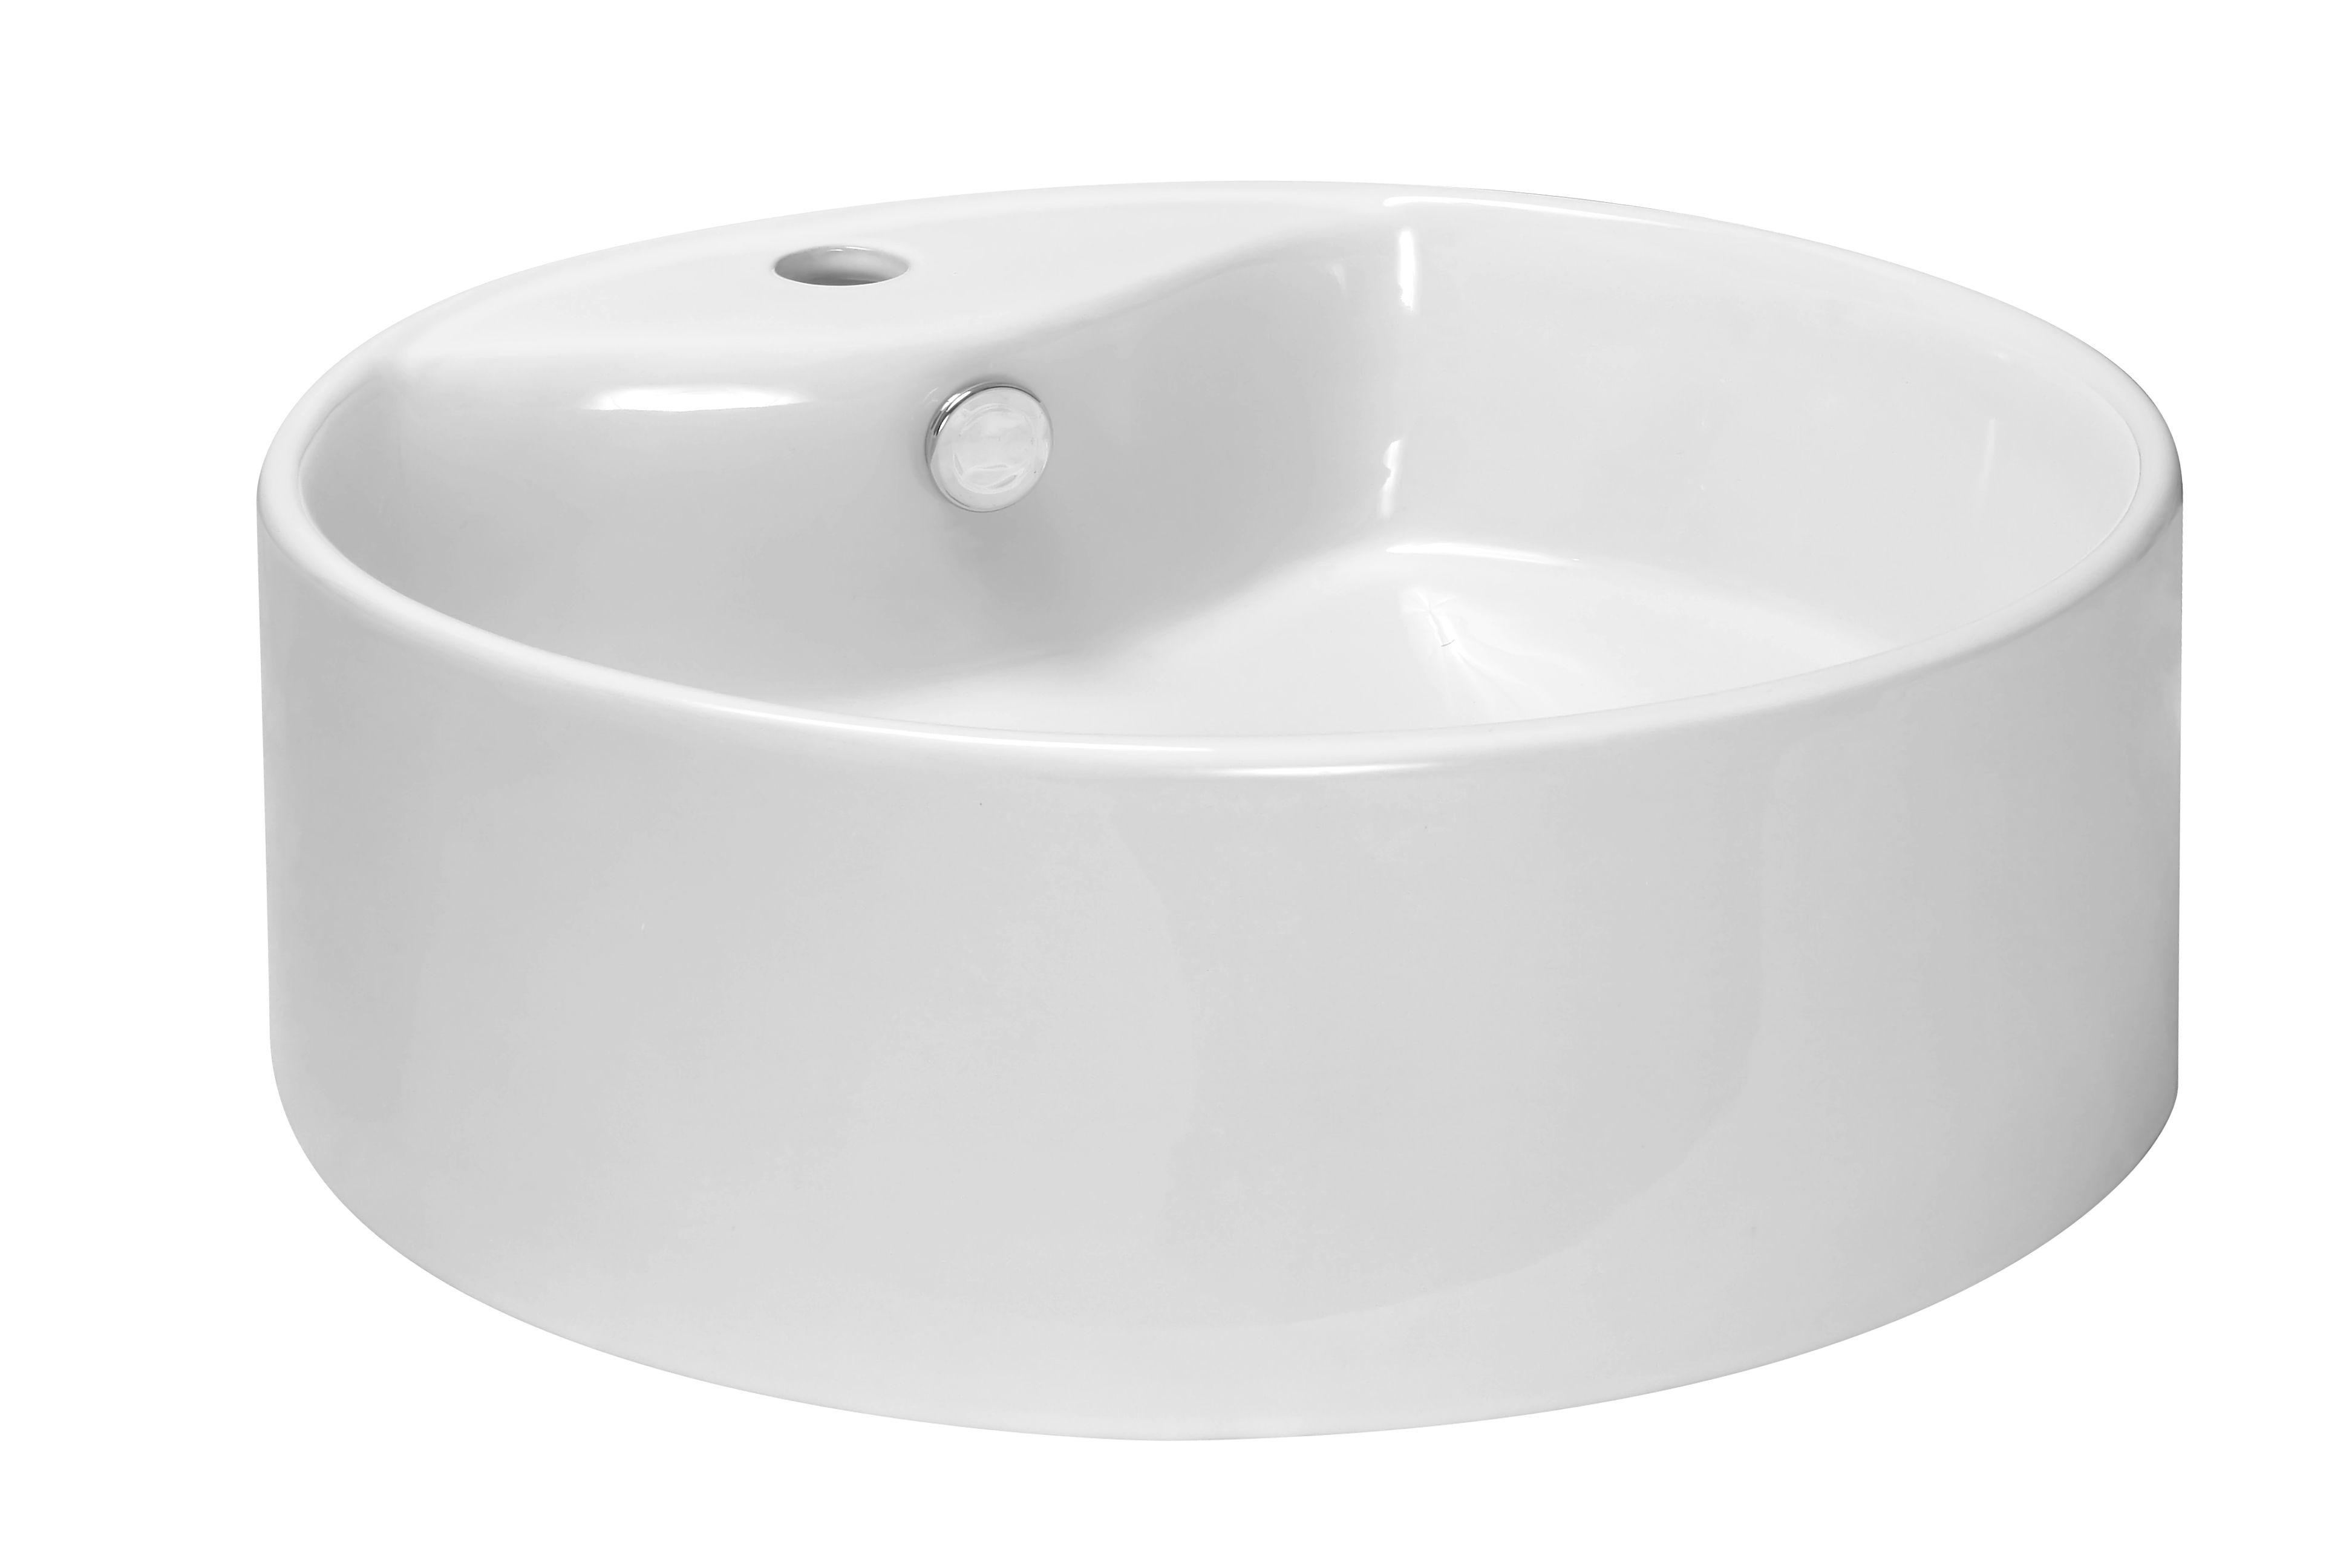 Badkamer Wasbak Opbouw : Badkamer accessoires kerra kr 138 opbouw waskom 46cm wit met kraangat